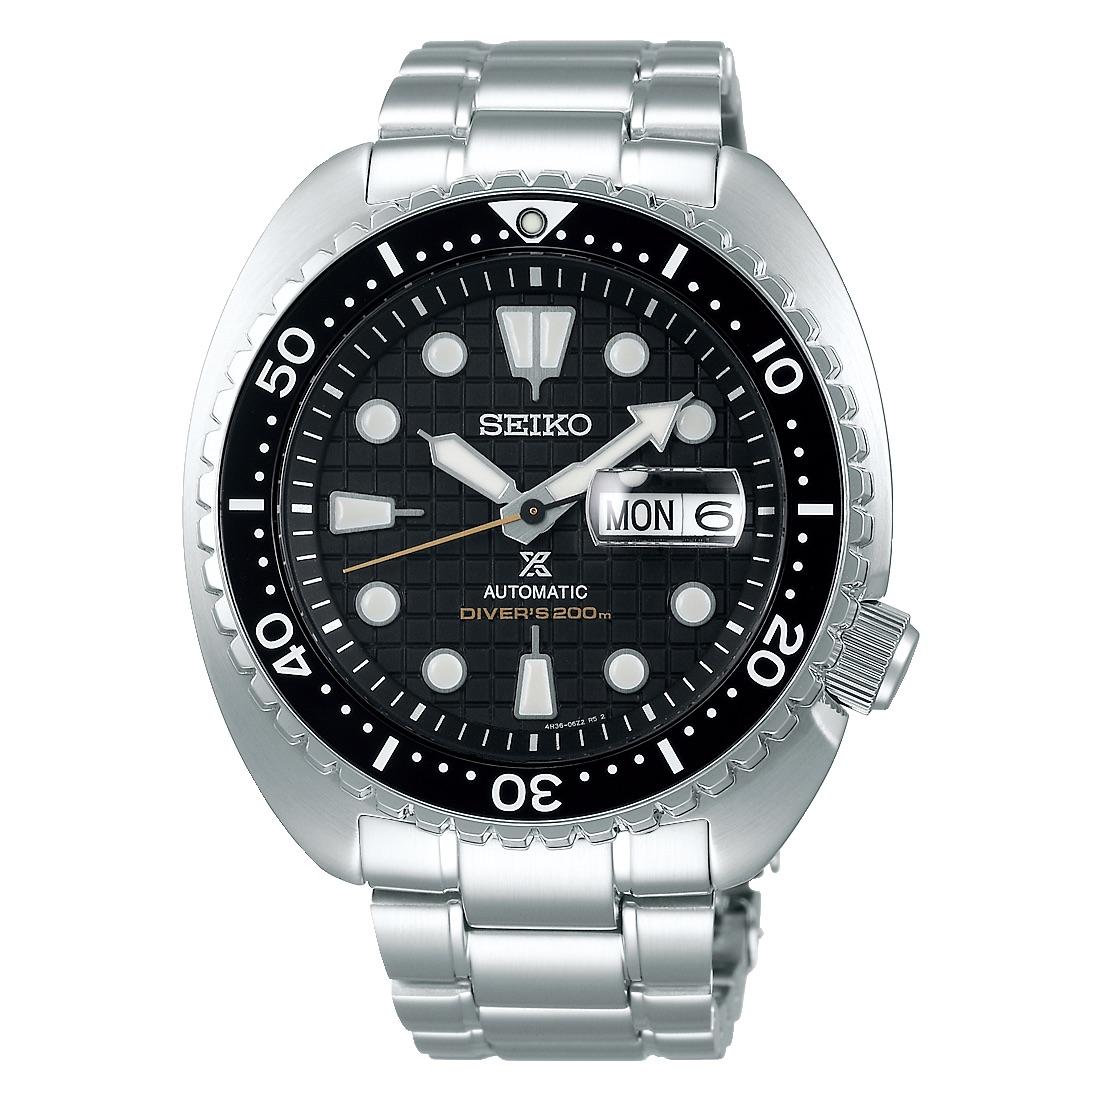 Seiko Prospex Automatic Diver 200m - Seiko King Turtle SRPE03 SRPE03K1